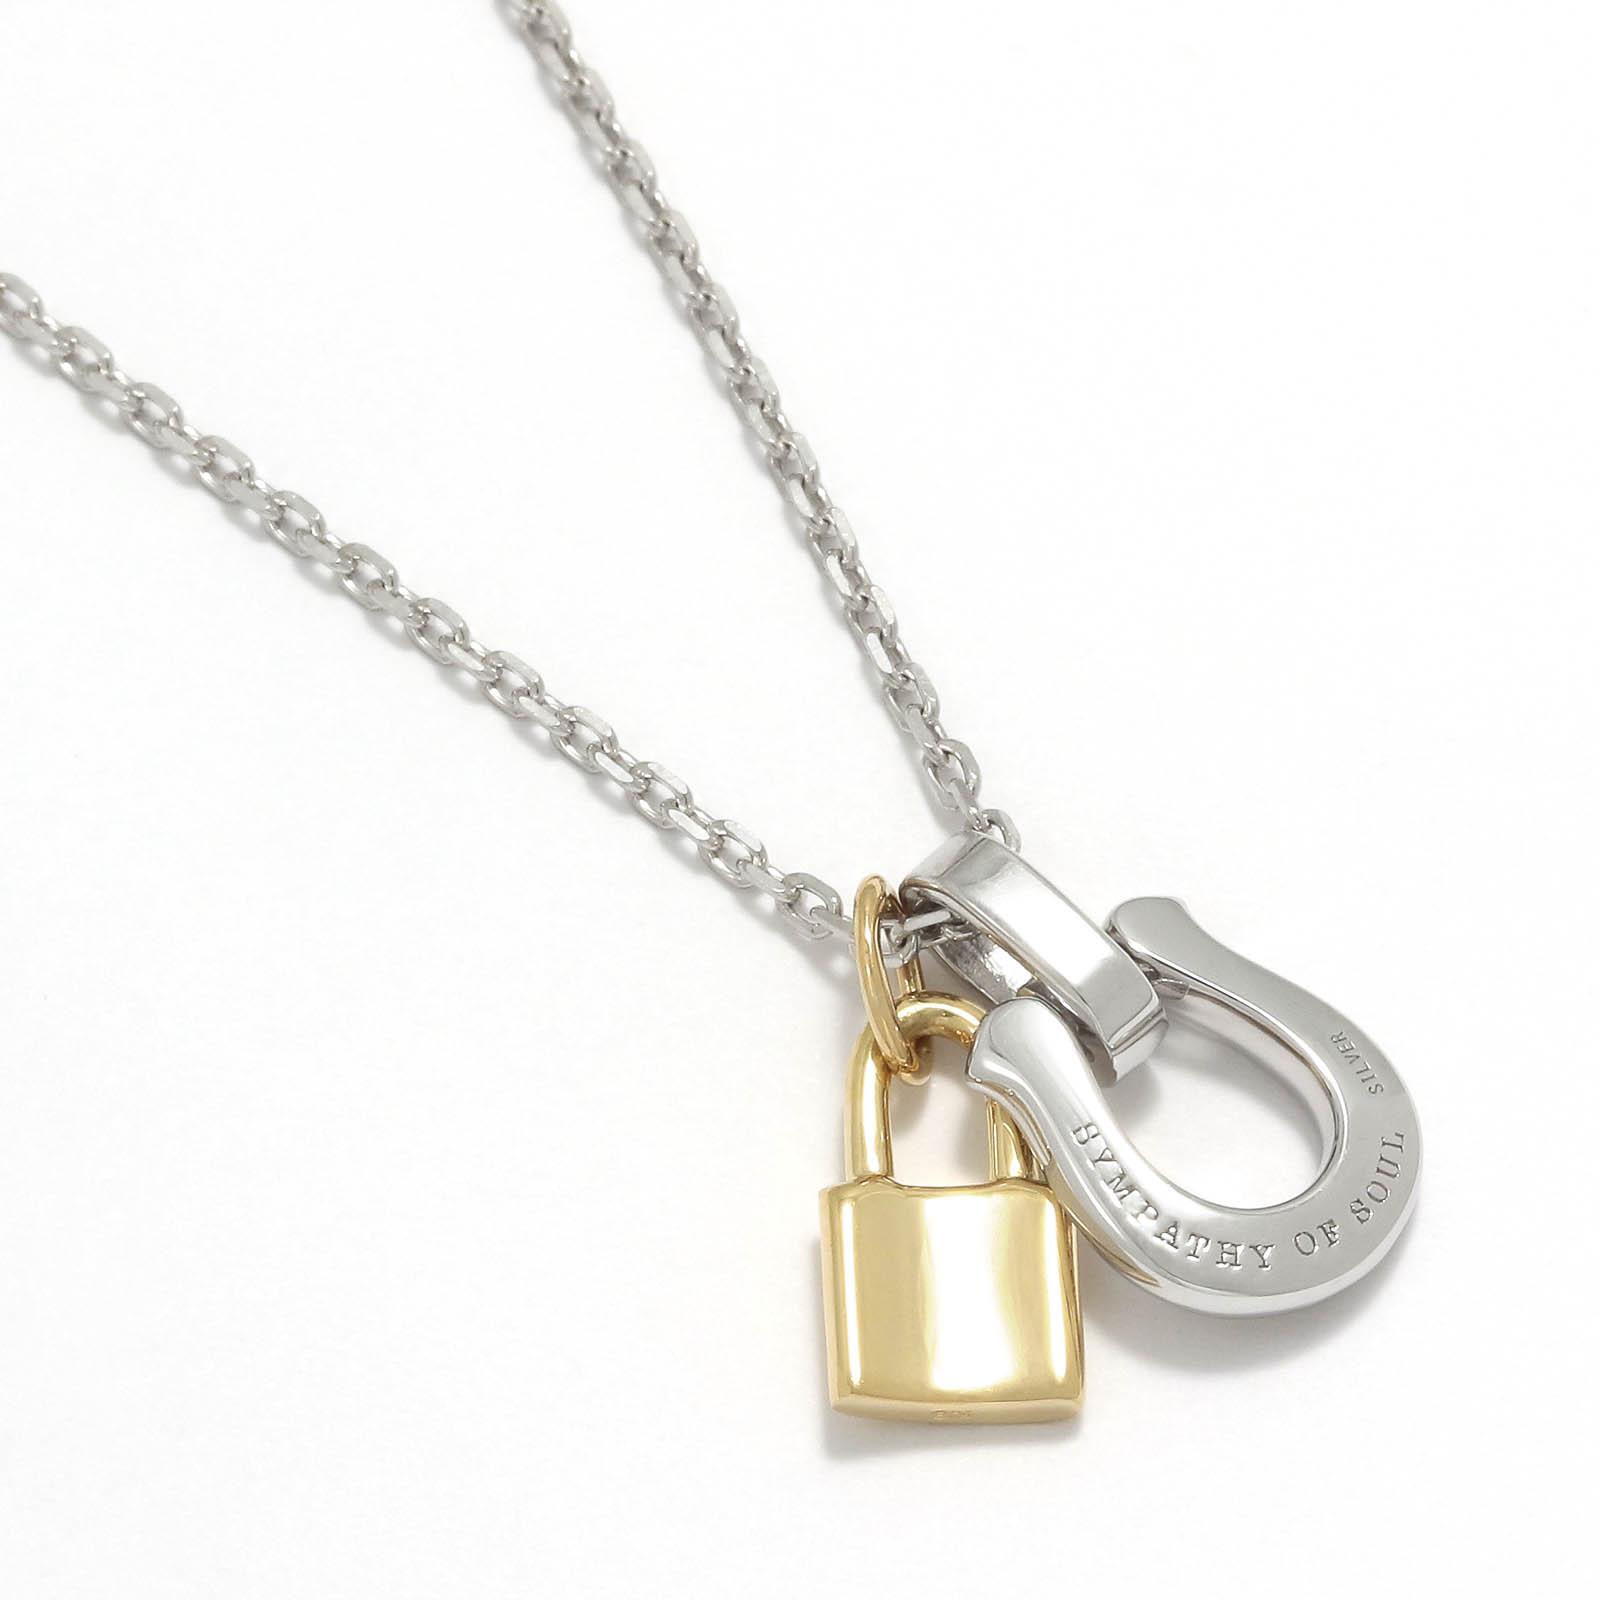 Horseshoe Amulet - Silver w/CZ + Small Key Charm - K18Yellow Gold Set Necklace